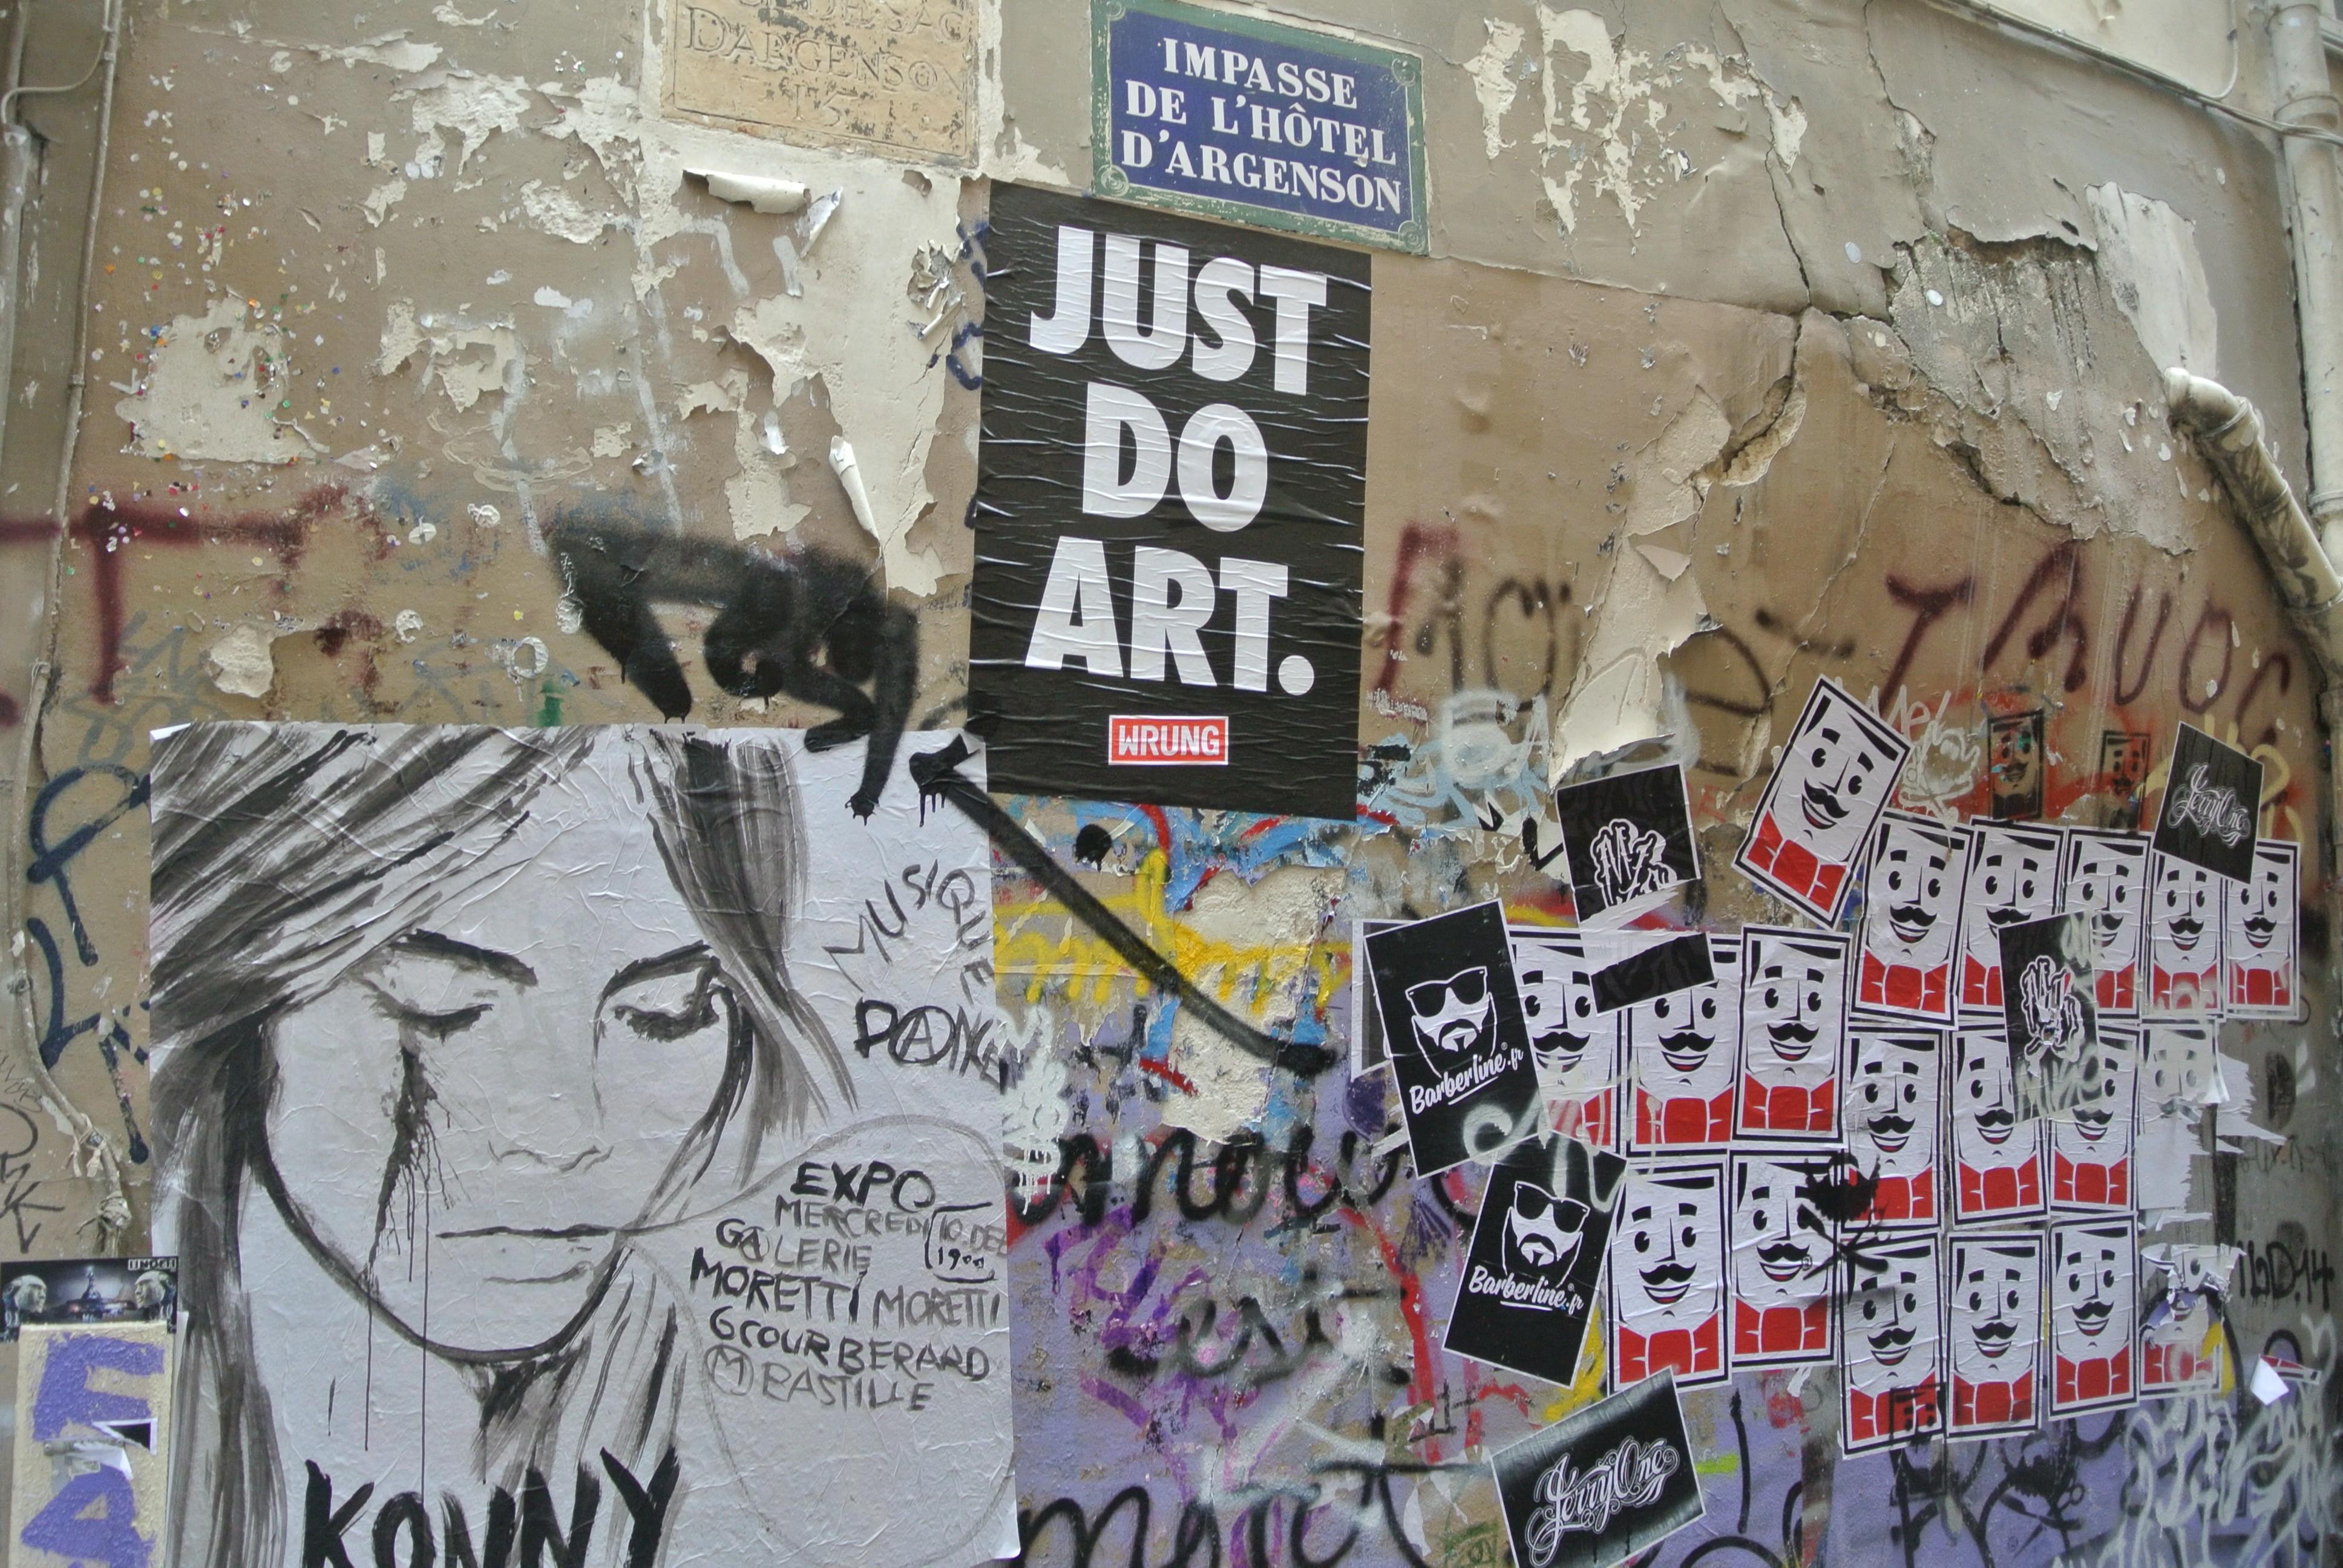 Just Do Art Le Marais Paris Street Art